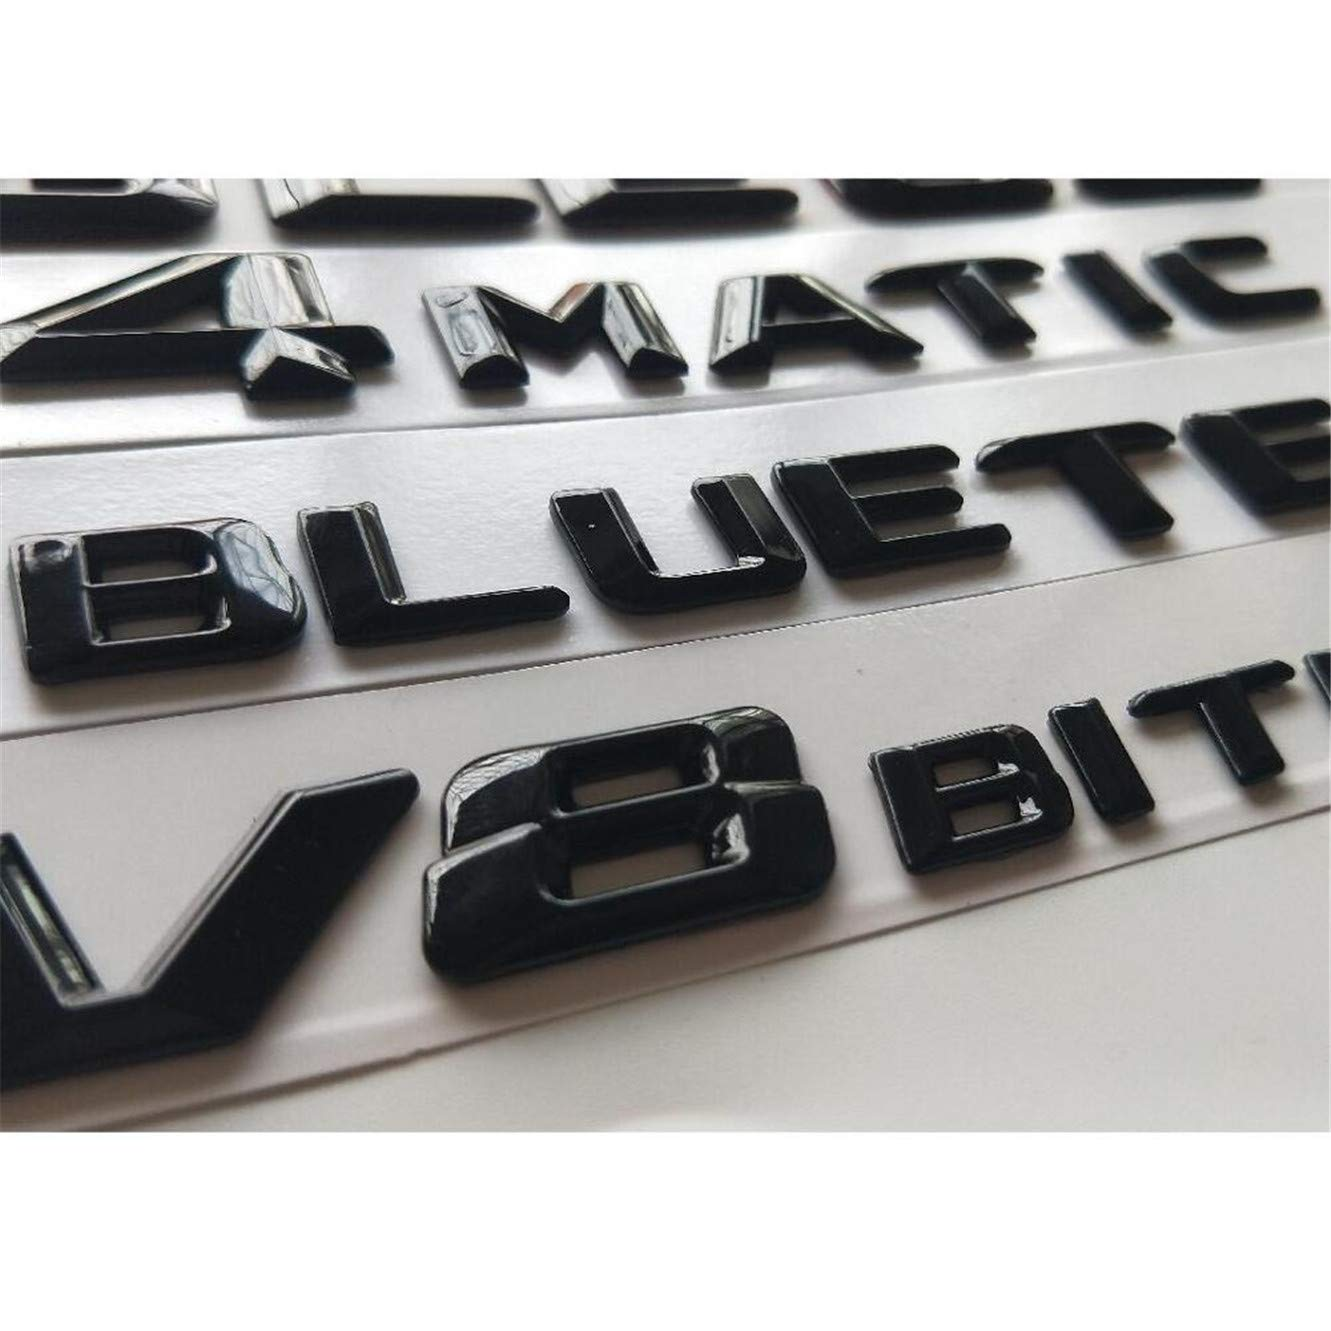 GLC 63s Gloss Black 3D Emblems W204 W205 Coupe C63 W212 W213 E63 W222 S63 CLS63 GLC63 GLE63 AMG 4MATIC V8 BITURBO